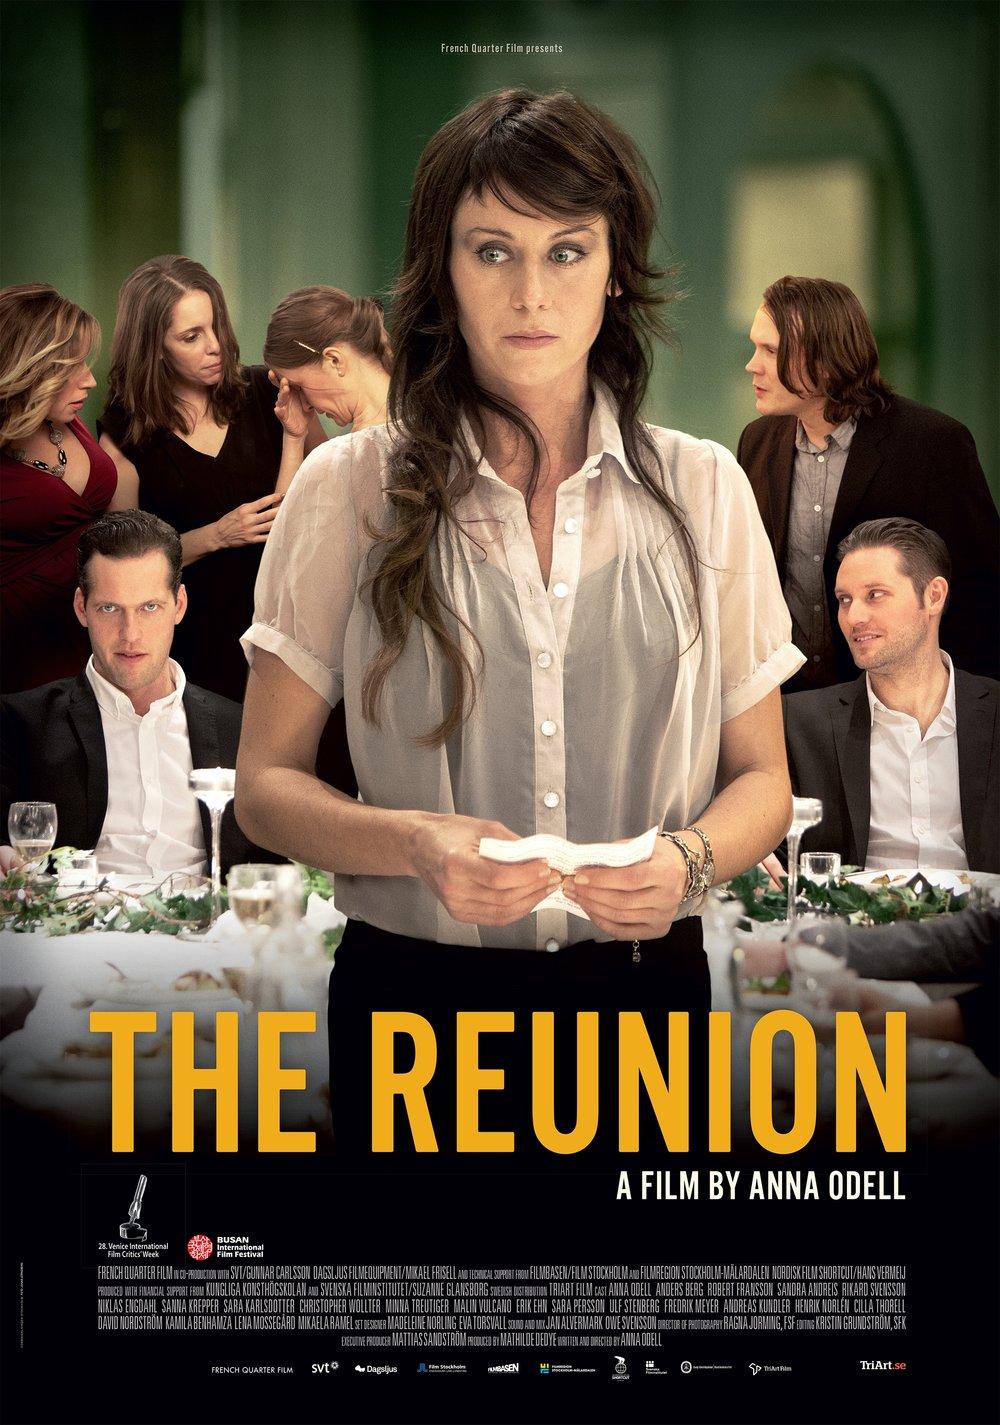 Återträffen (The Reunion) - feature fiction by Anna Odell (2014)